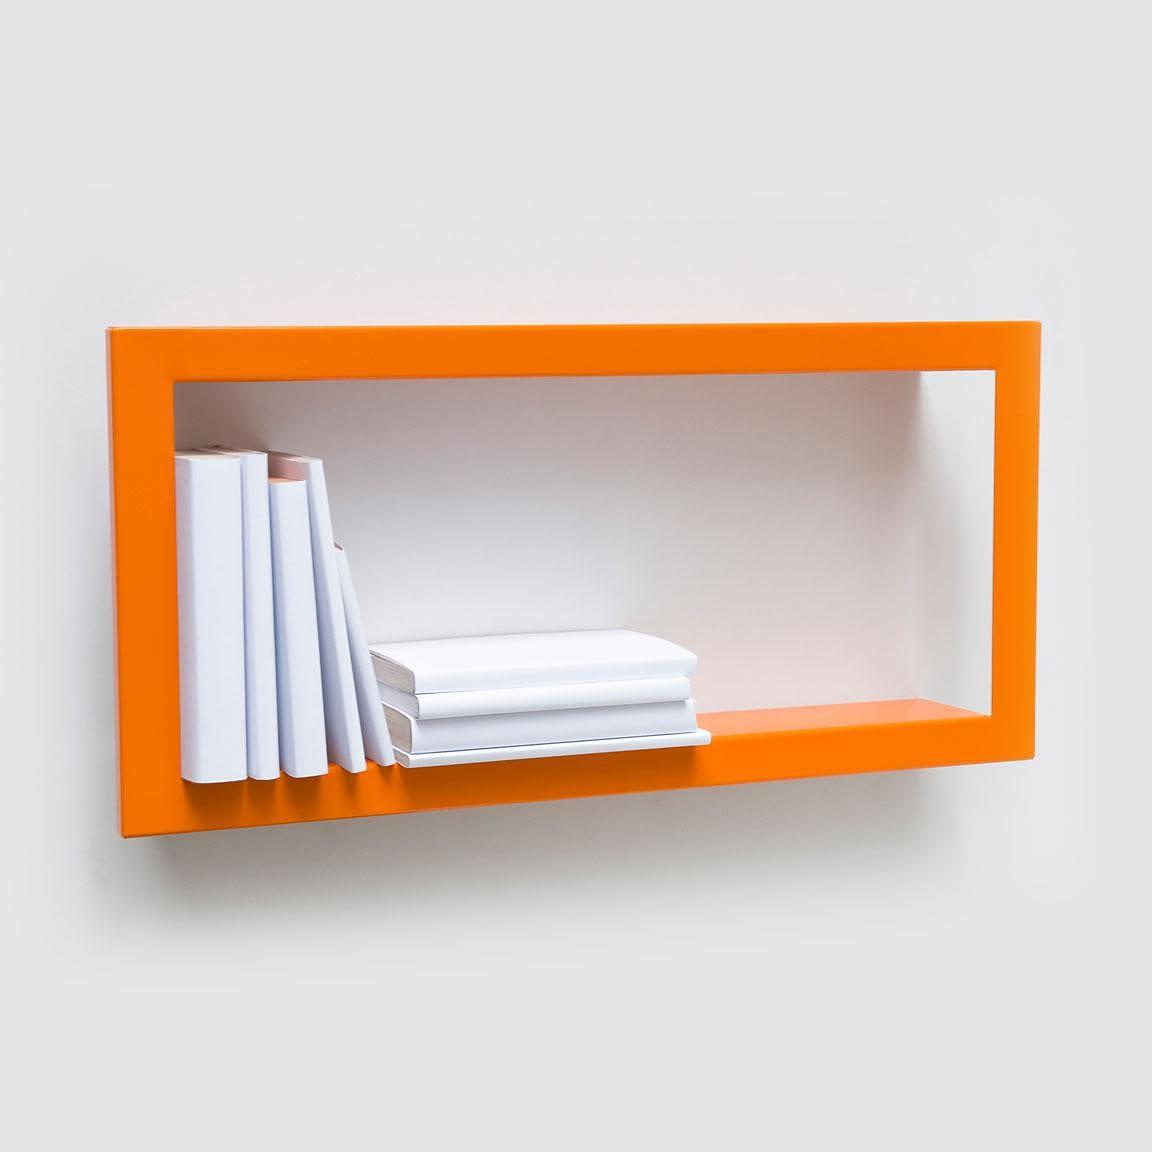 framed wall shelves by presse citron design is this. Black Bedroom Furniture Sets. Home Design Ideas